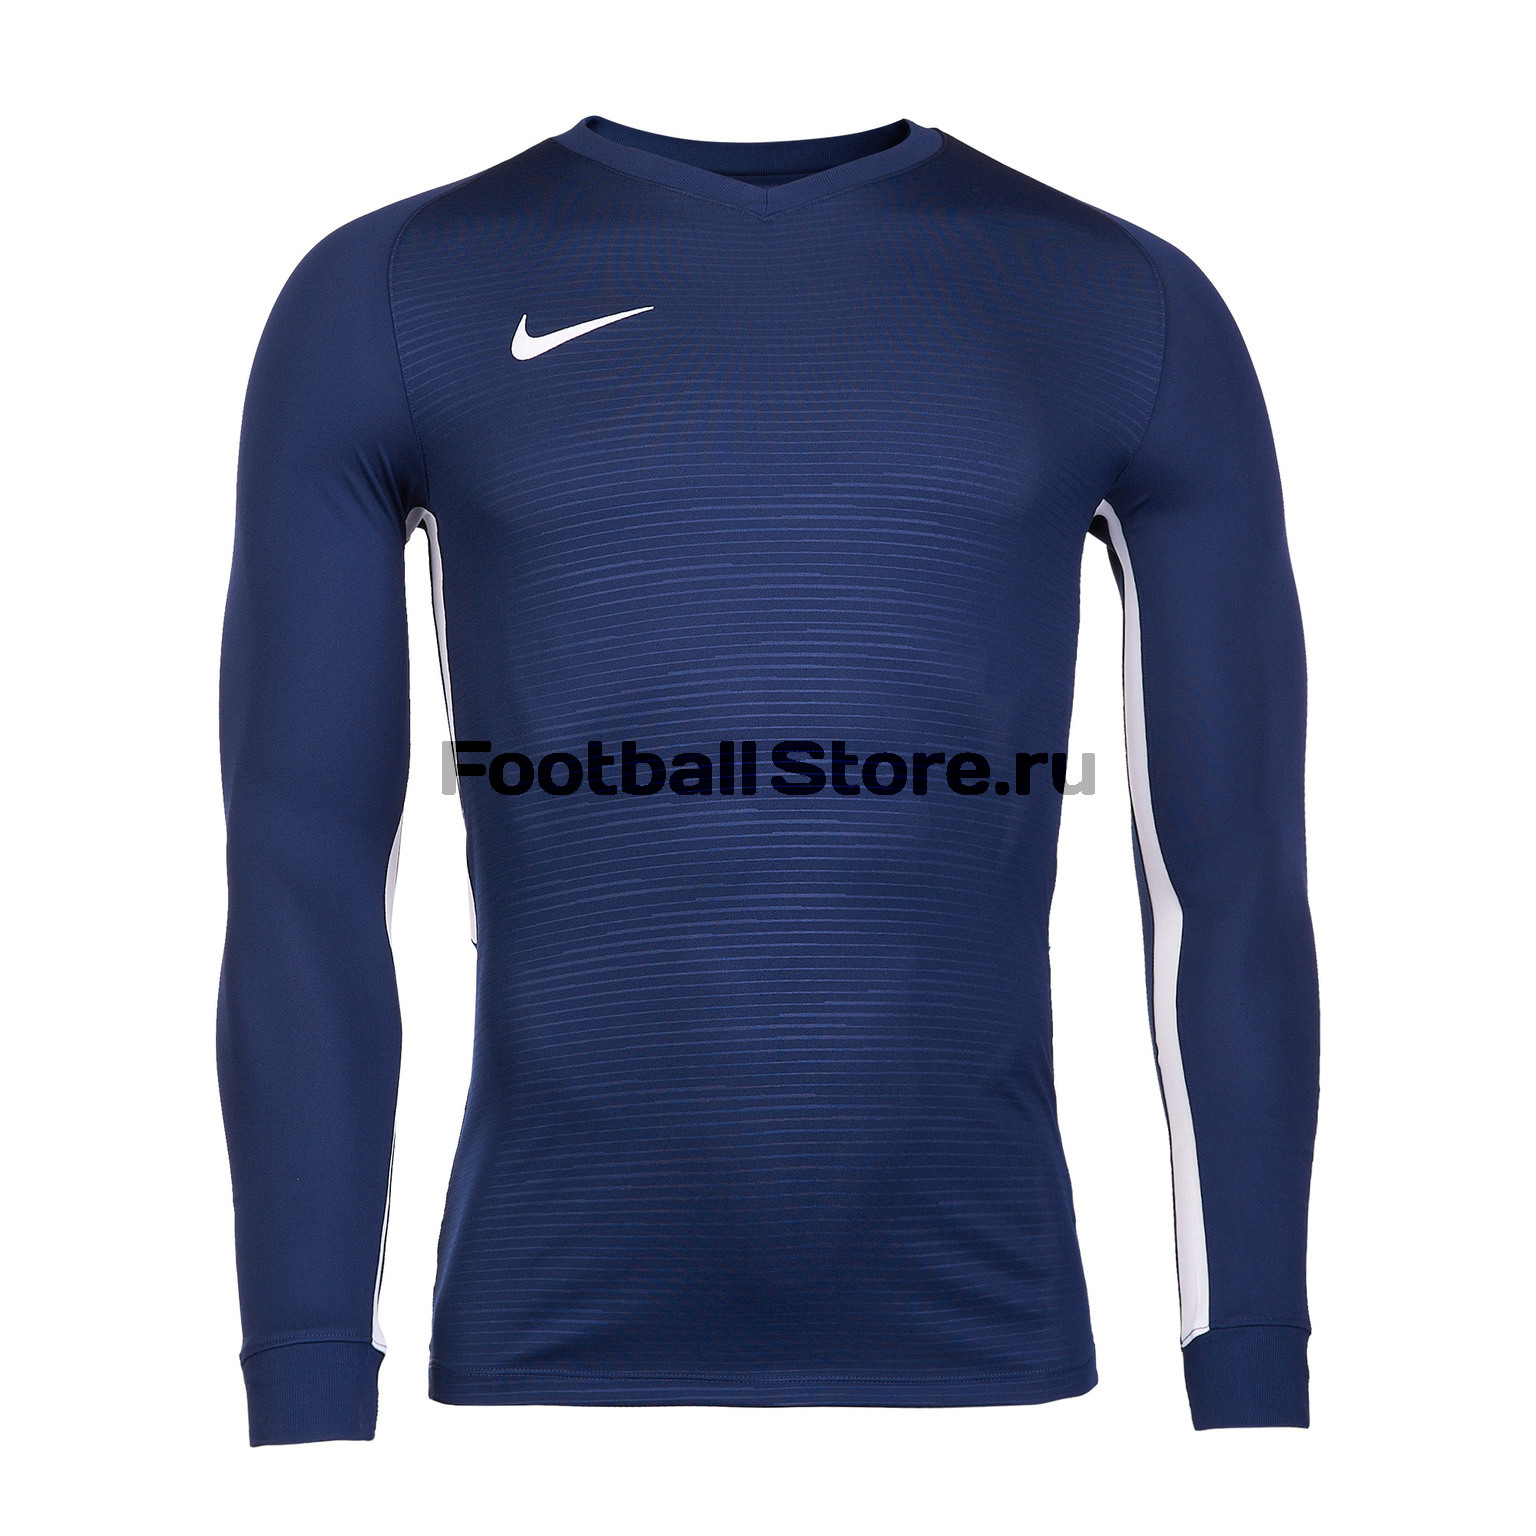 Футболка игровая Nike Dry Tiempo Prem JSY LS 894248-411 футболка игровая nike dry tiempo prem jsy ss 894230 412